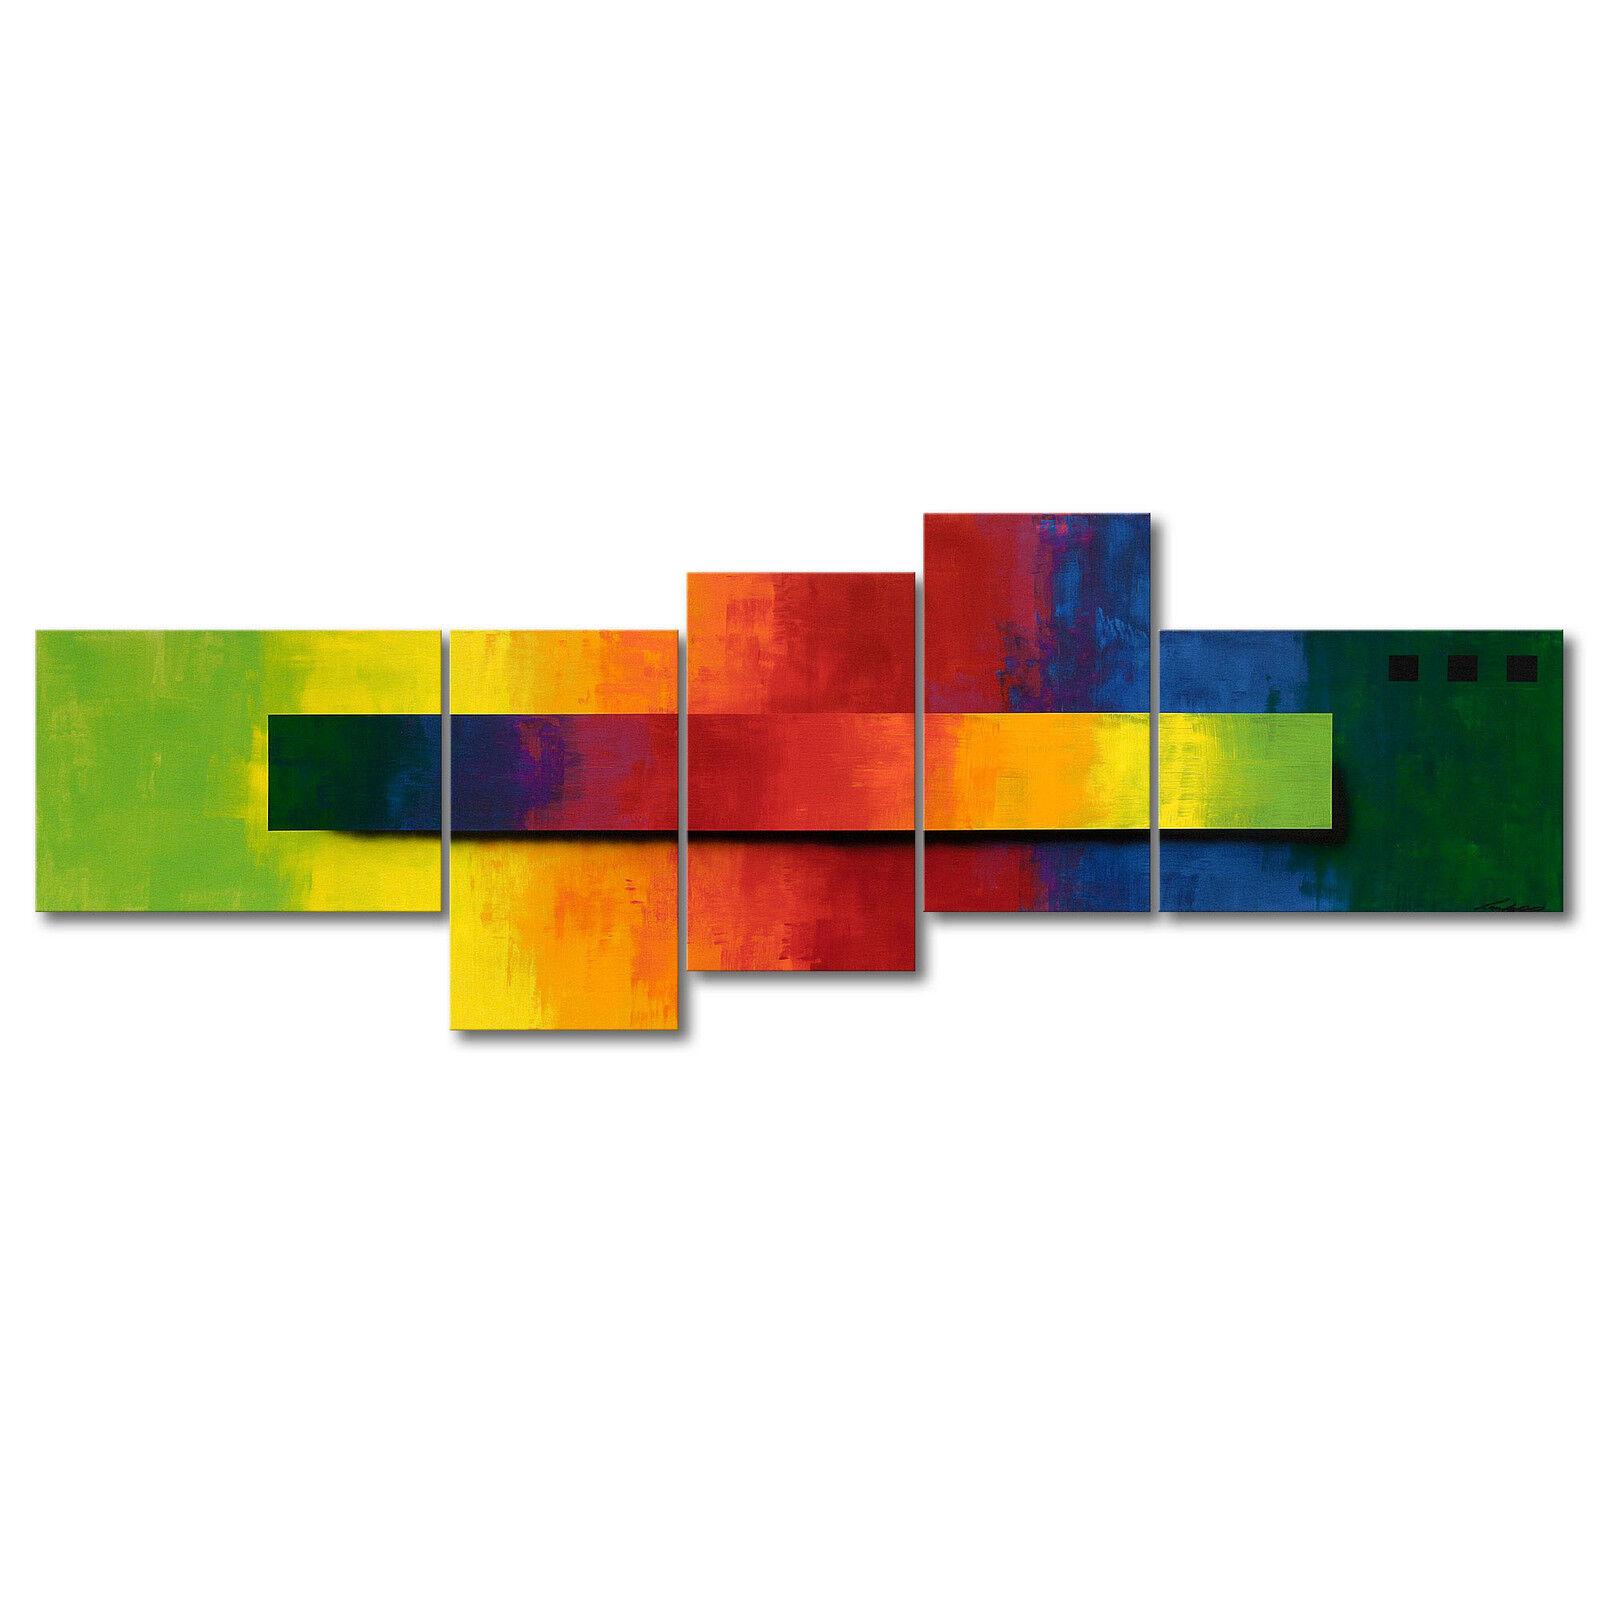 100% handgemaltes Bild - Das XXL Wandbild  Facets of a Rainbow